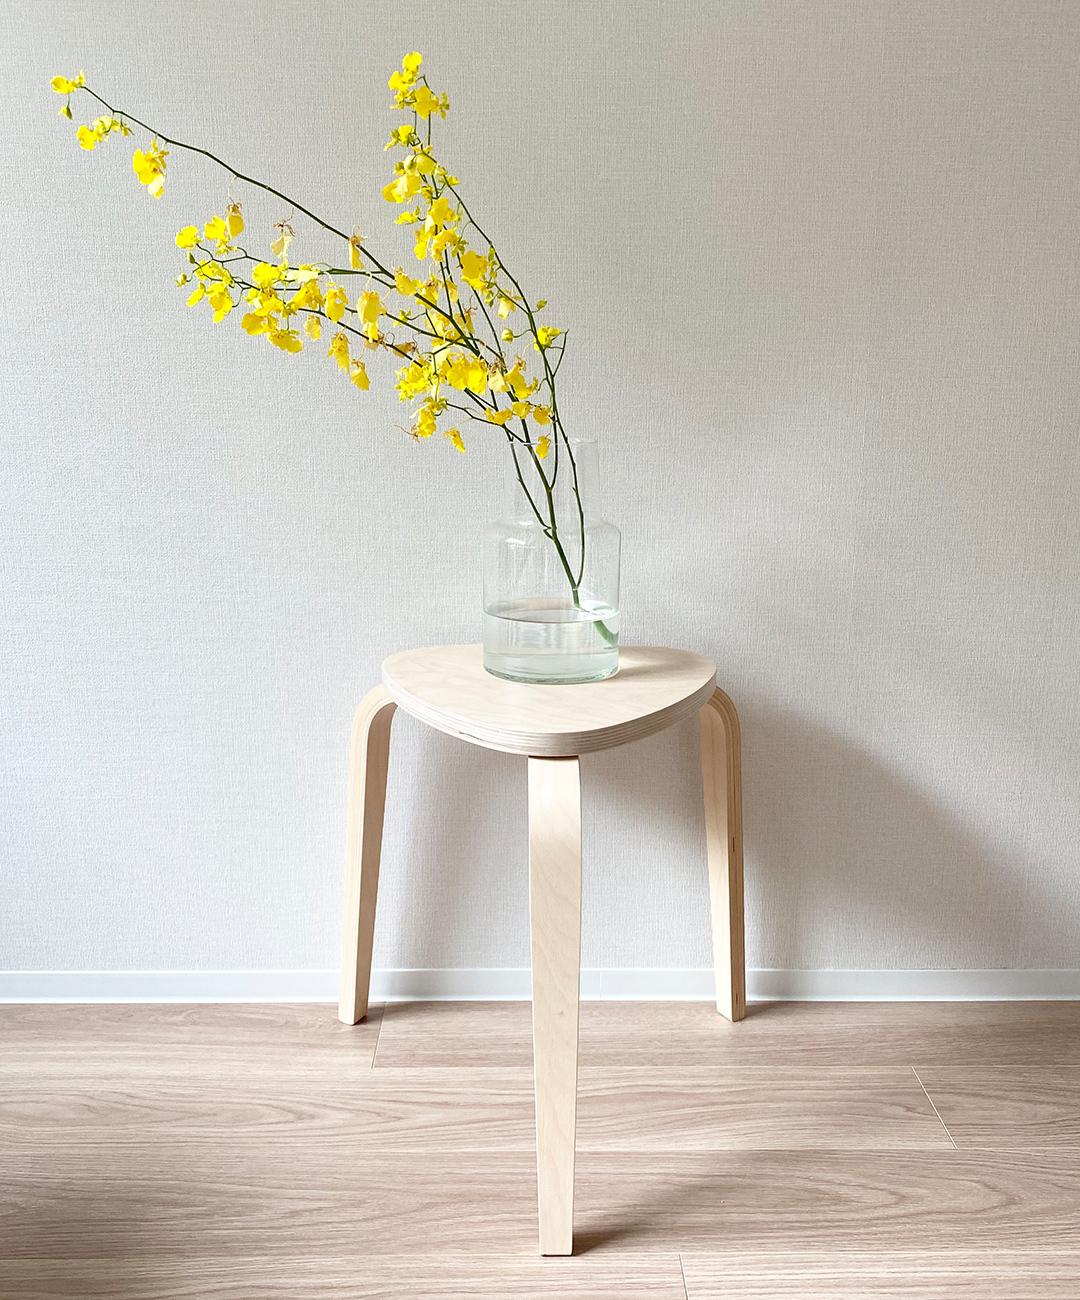 IKEAのインテリア名品をもっと見る_1_3